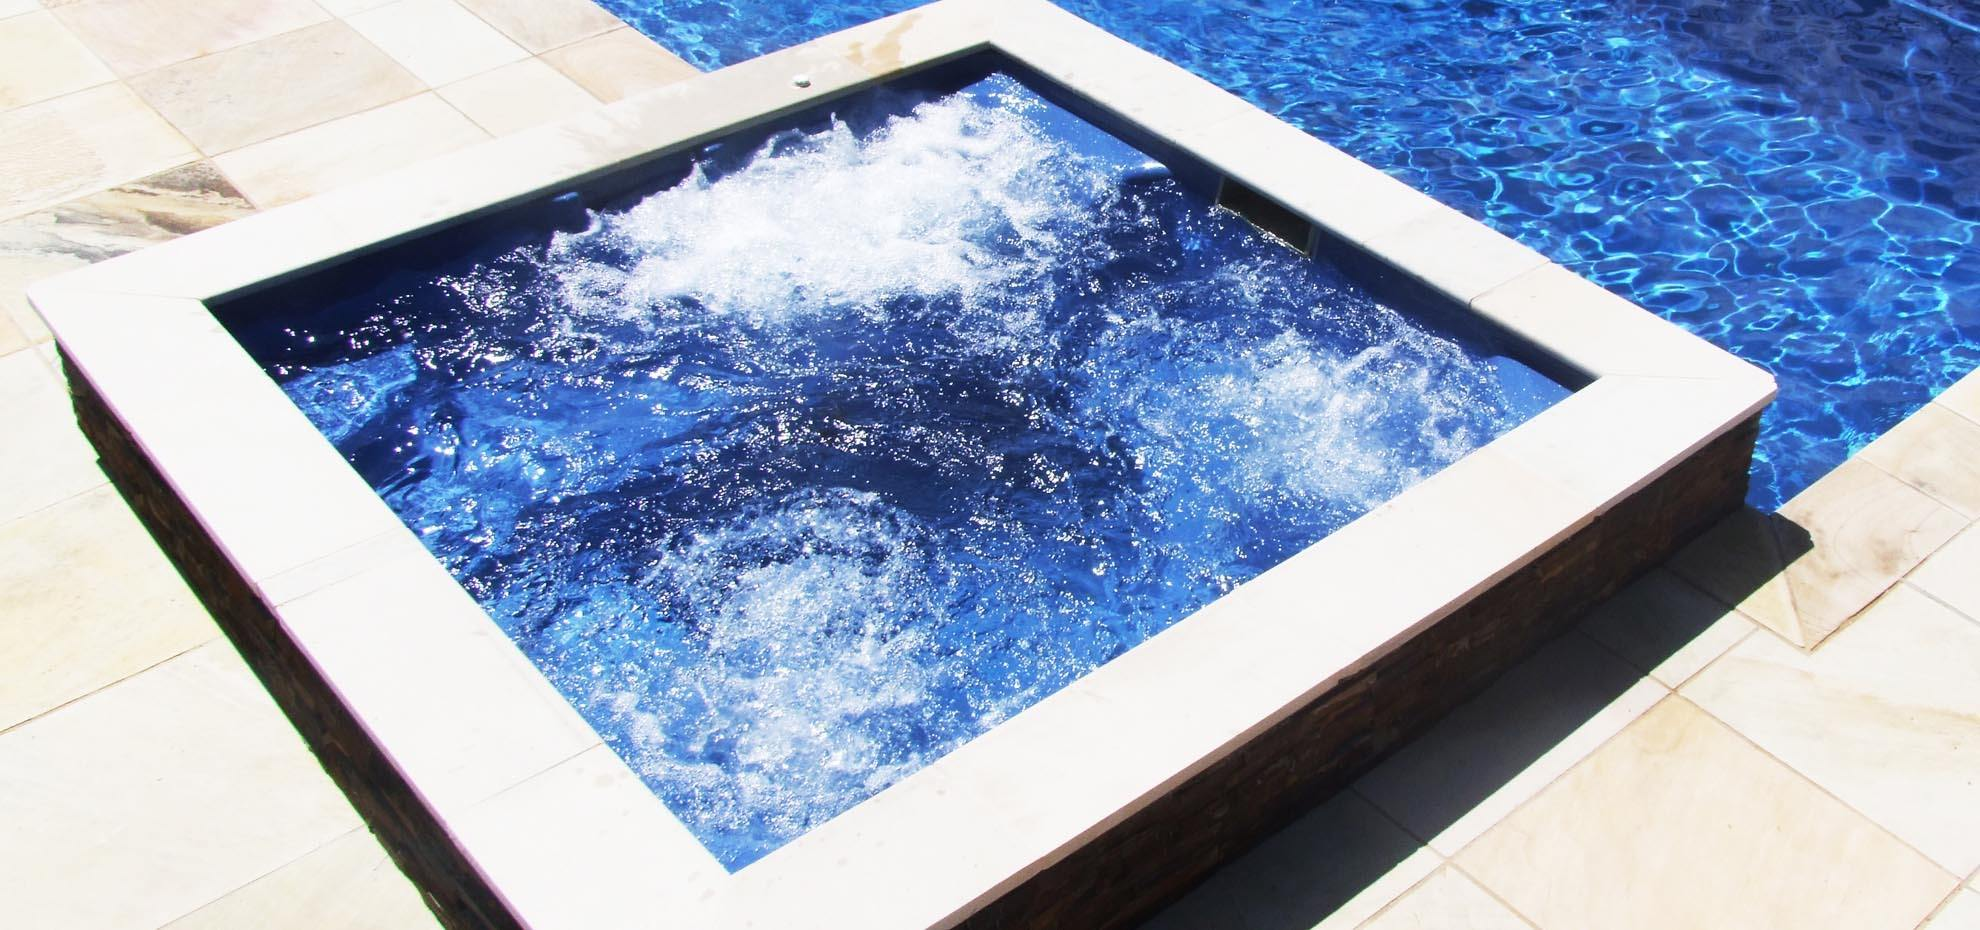 Fiberglass pool by Leisure Pools